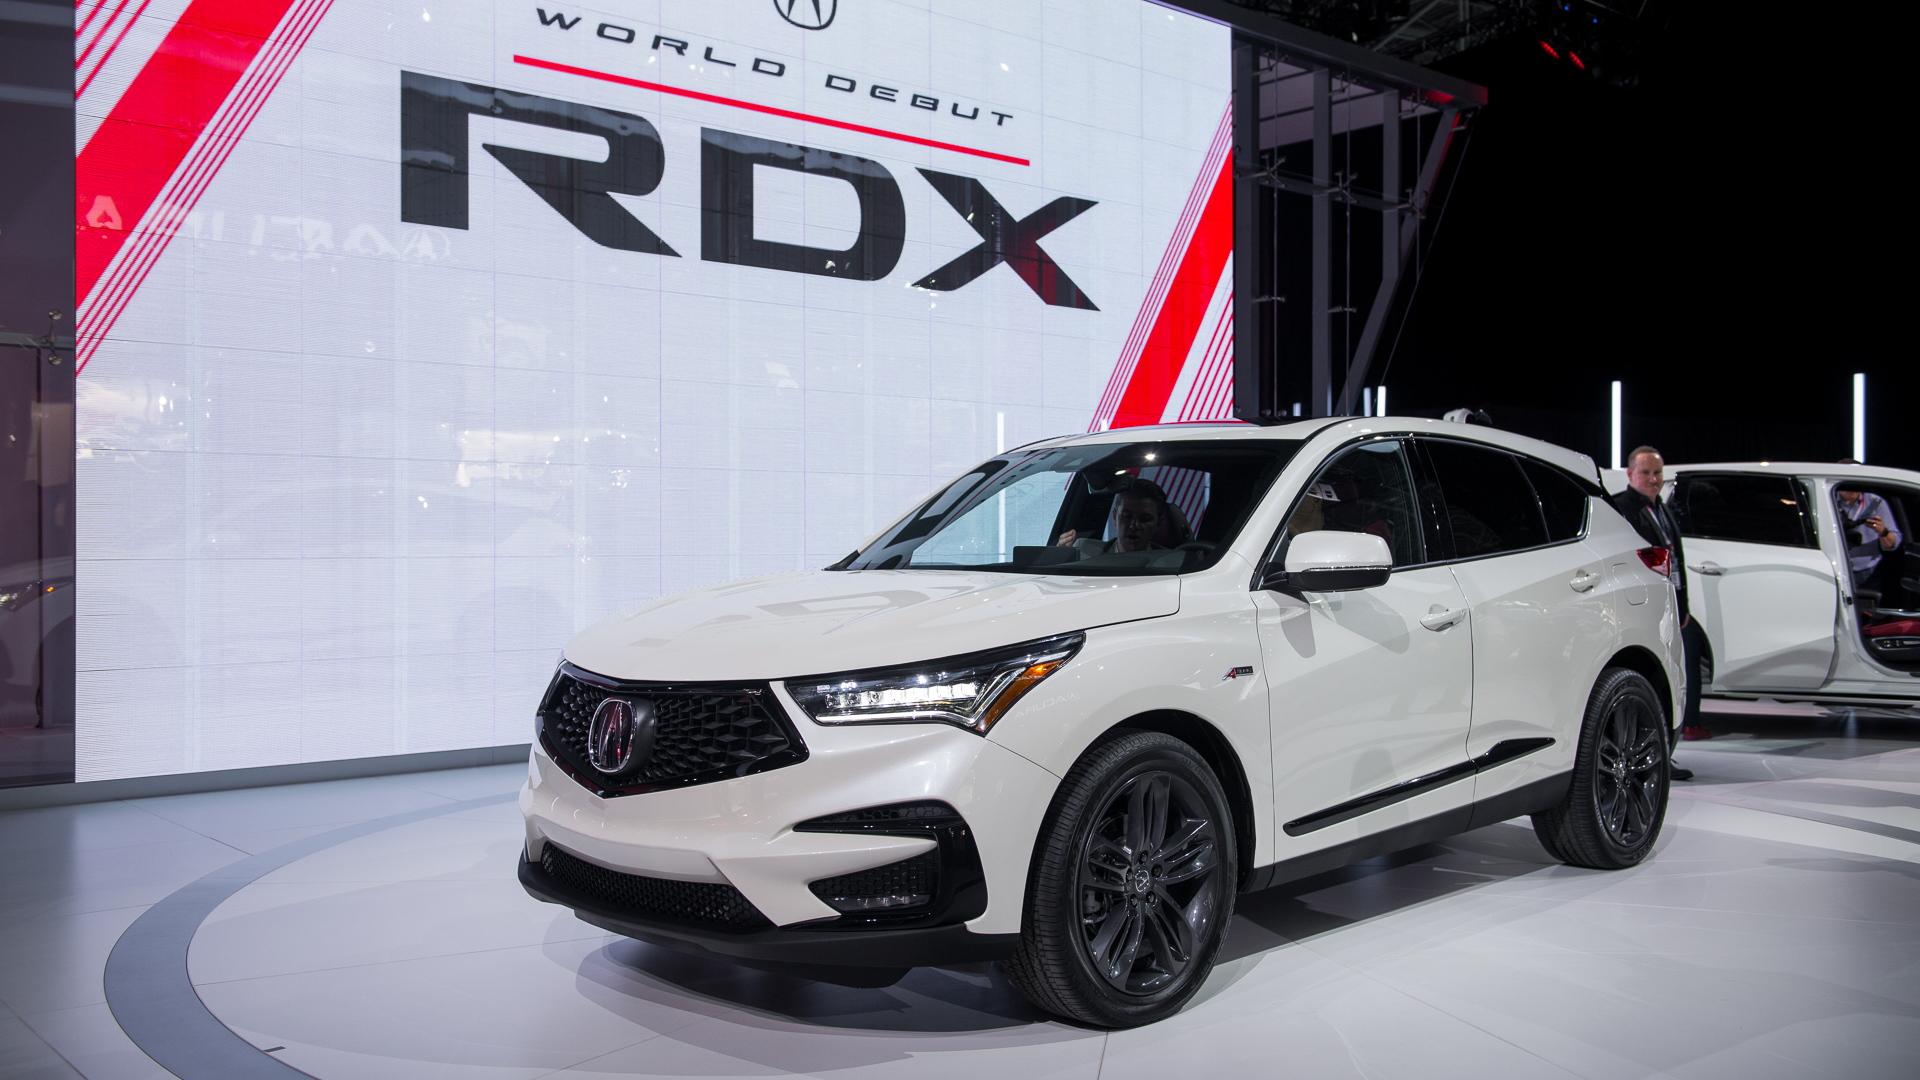 2019 Acura RDX, 2018 New York auto show